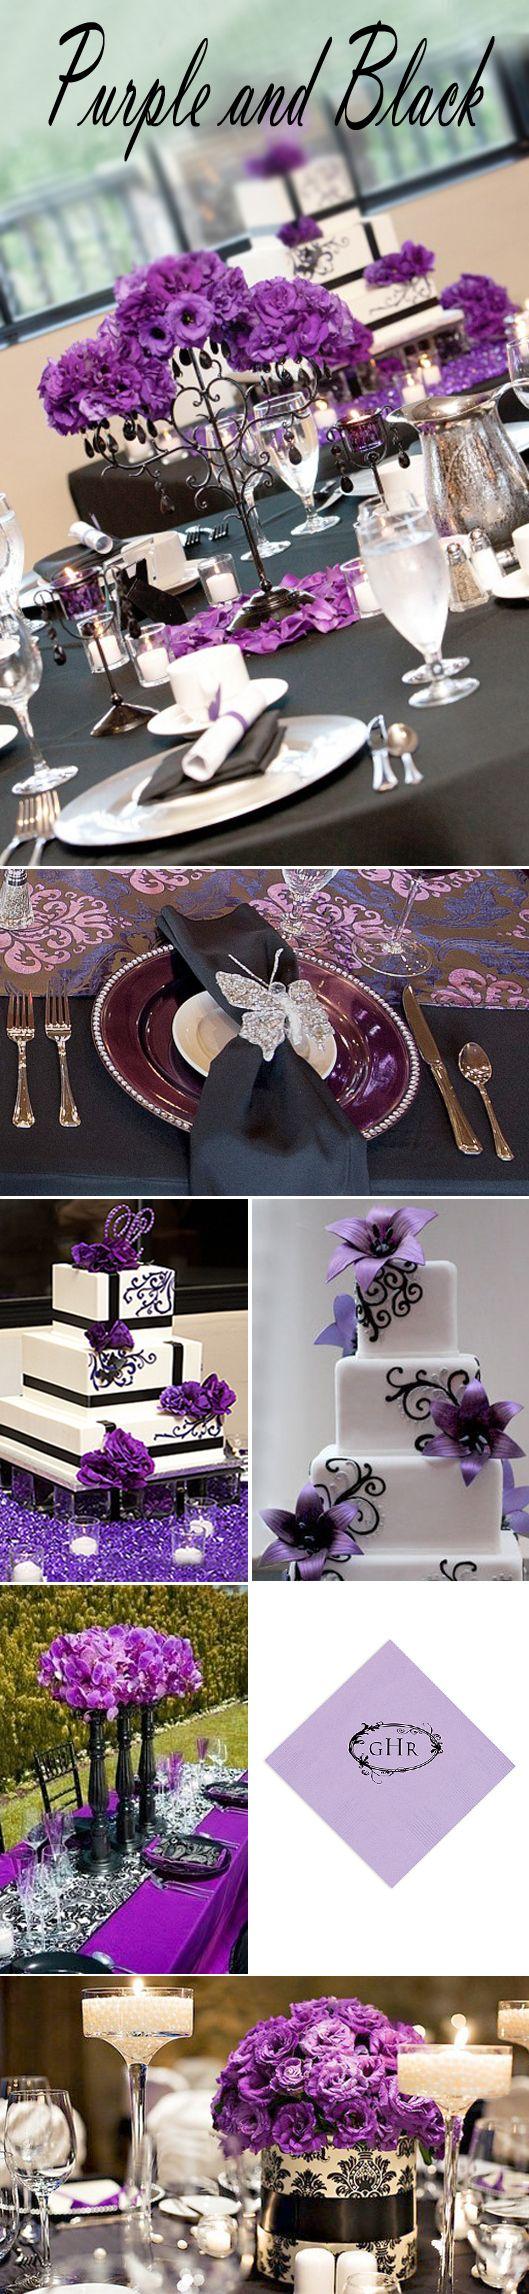 Purple and Black Wedding Theme Collage~